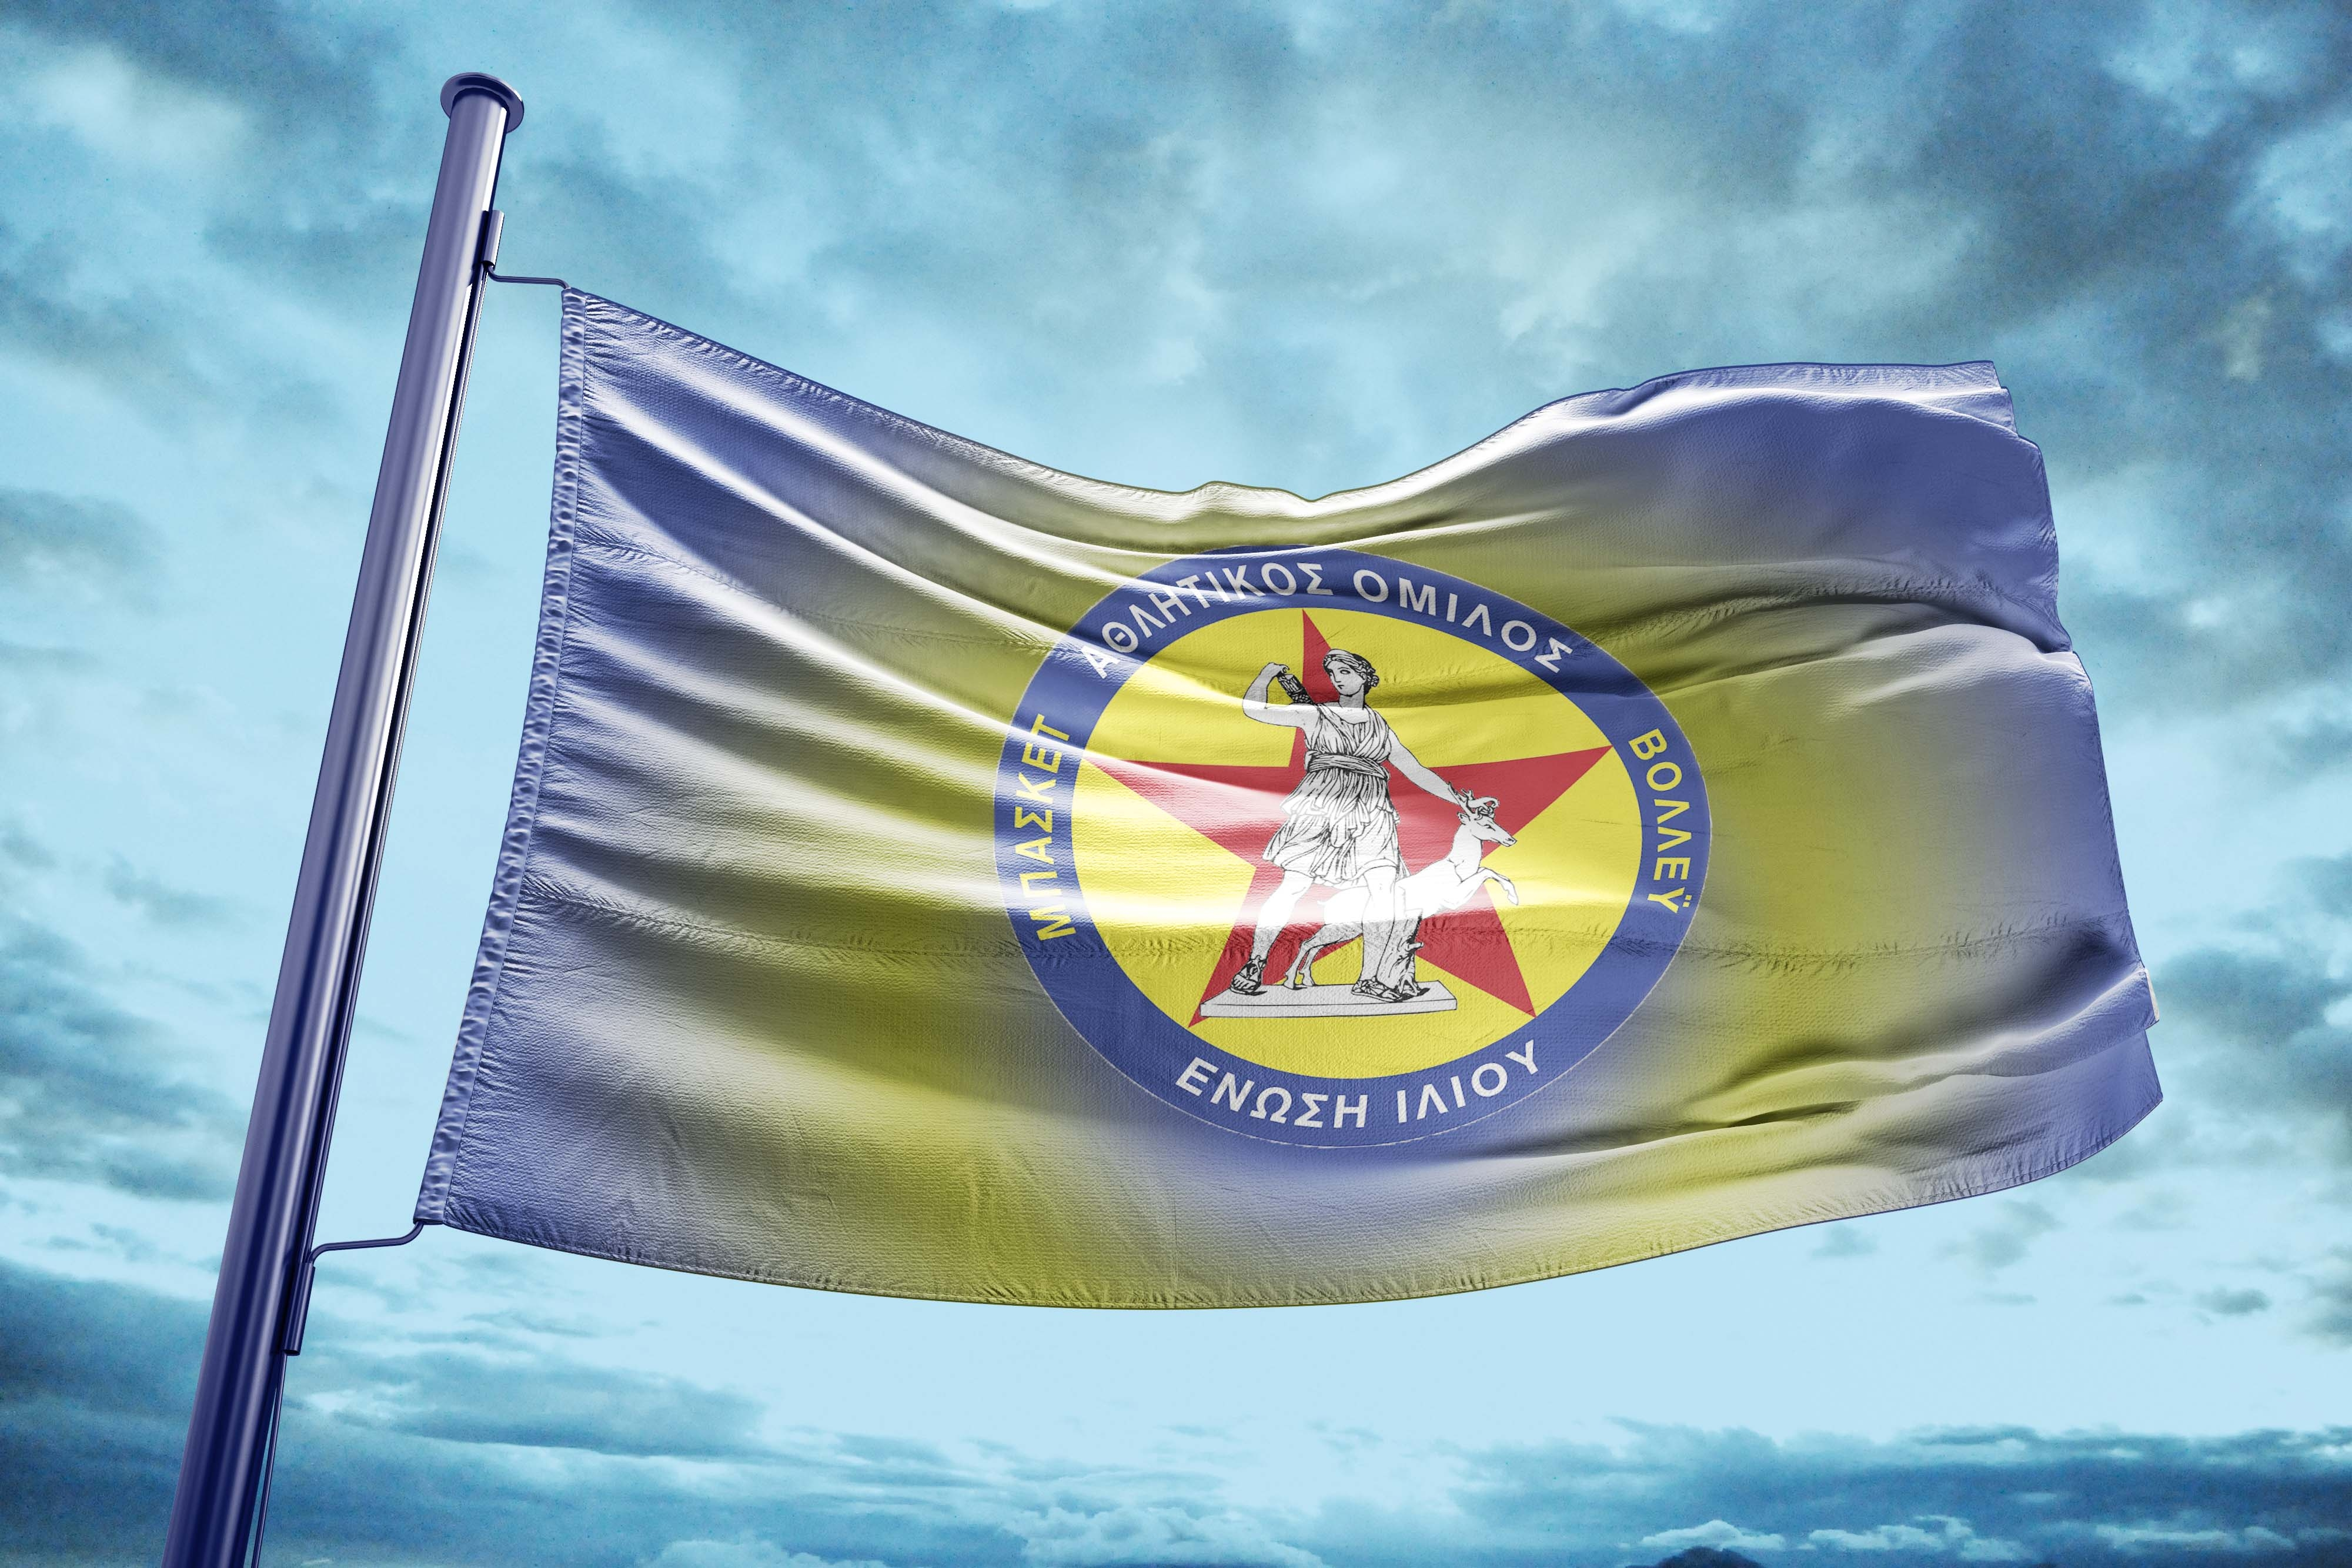 IΚύπελλο ΕΣΚΑ Ανδρών: ΑΣ Παπάγου - Ένωση Ιλίου 71-57